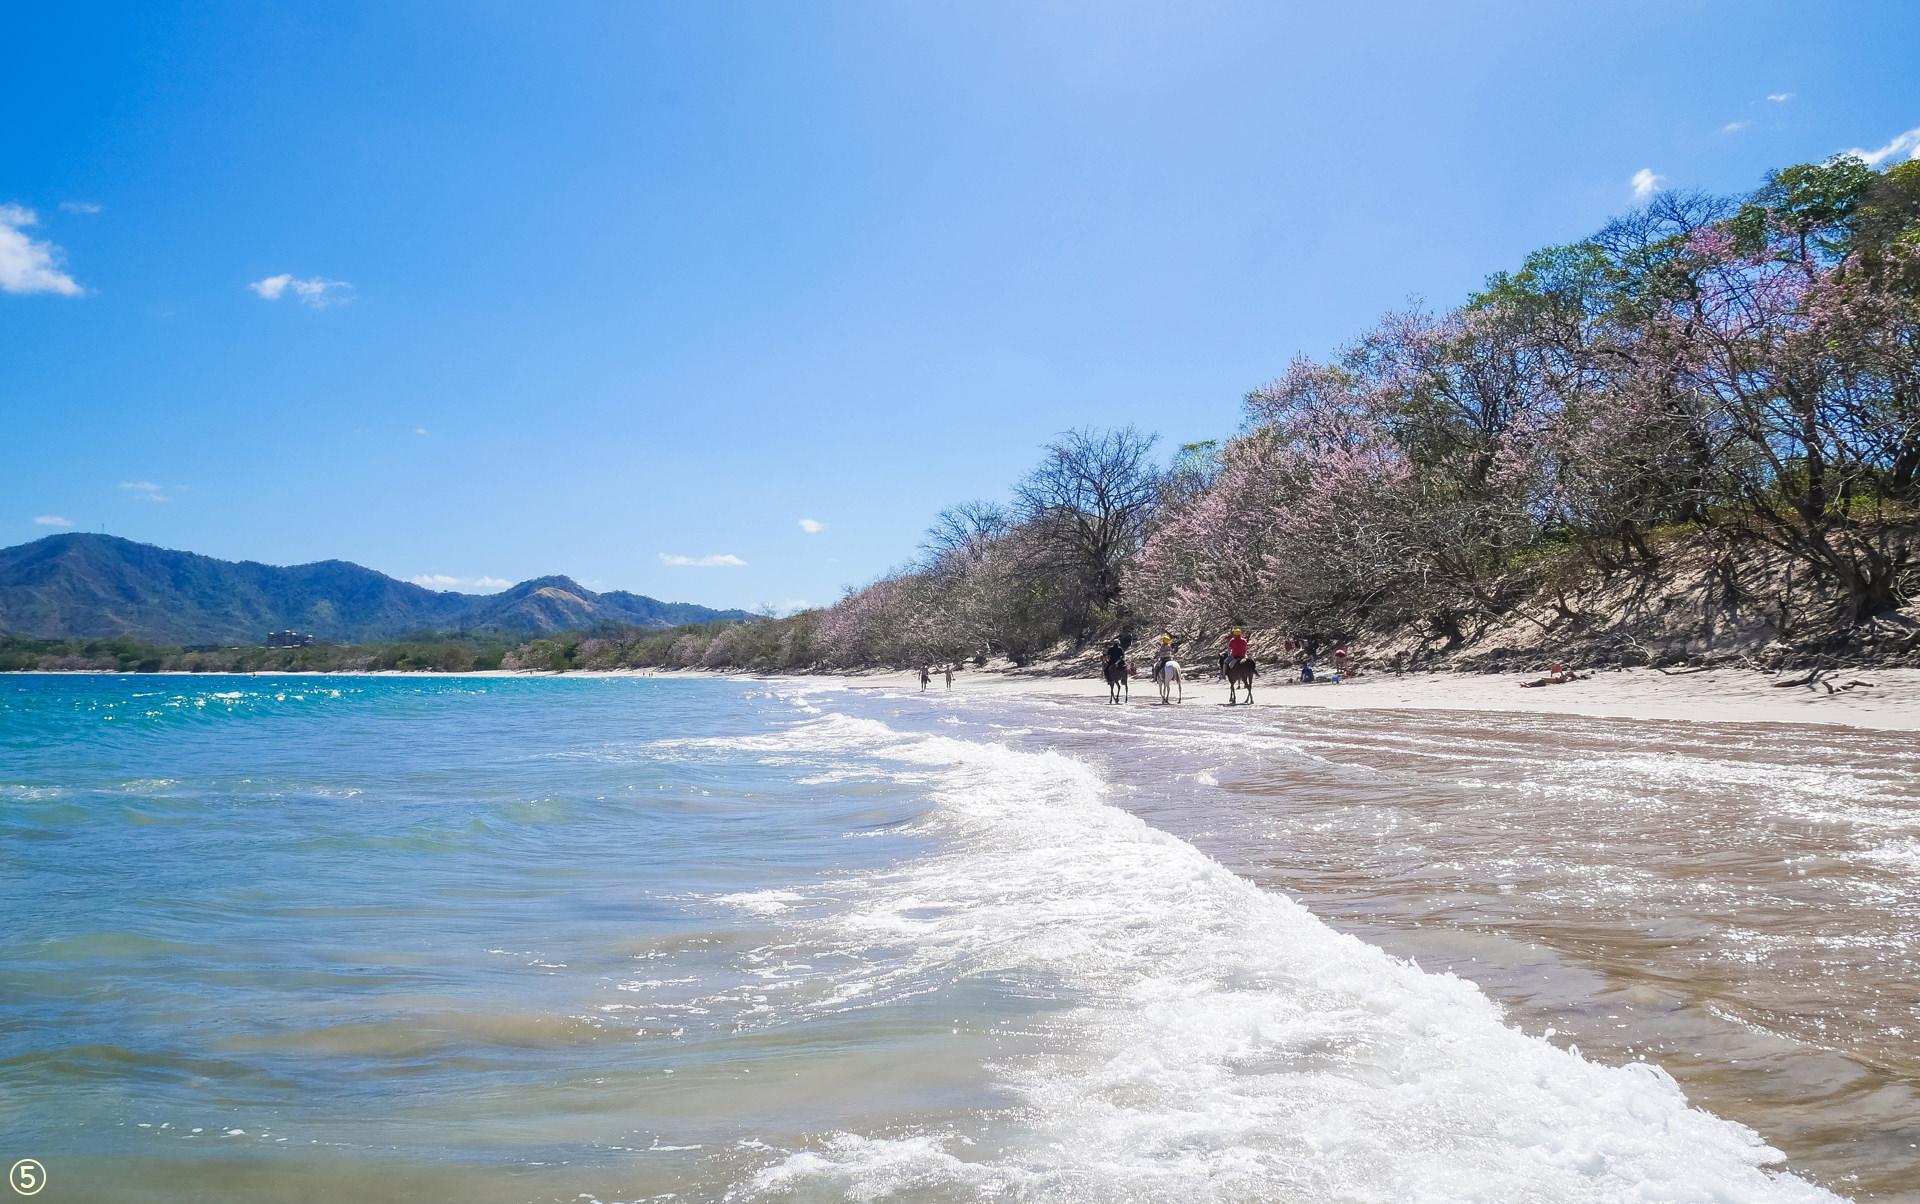 playa conchal beach guanacaste costa rica